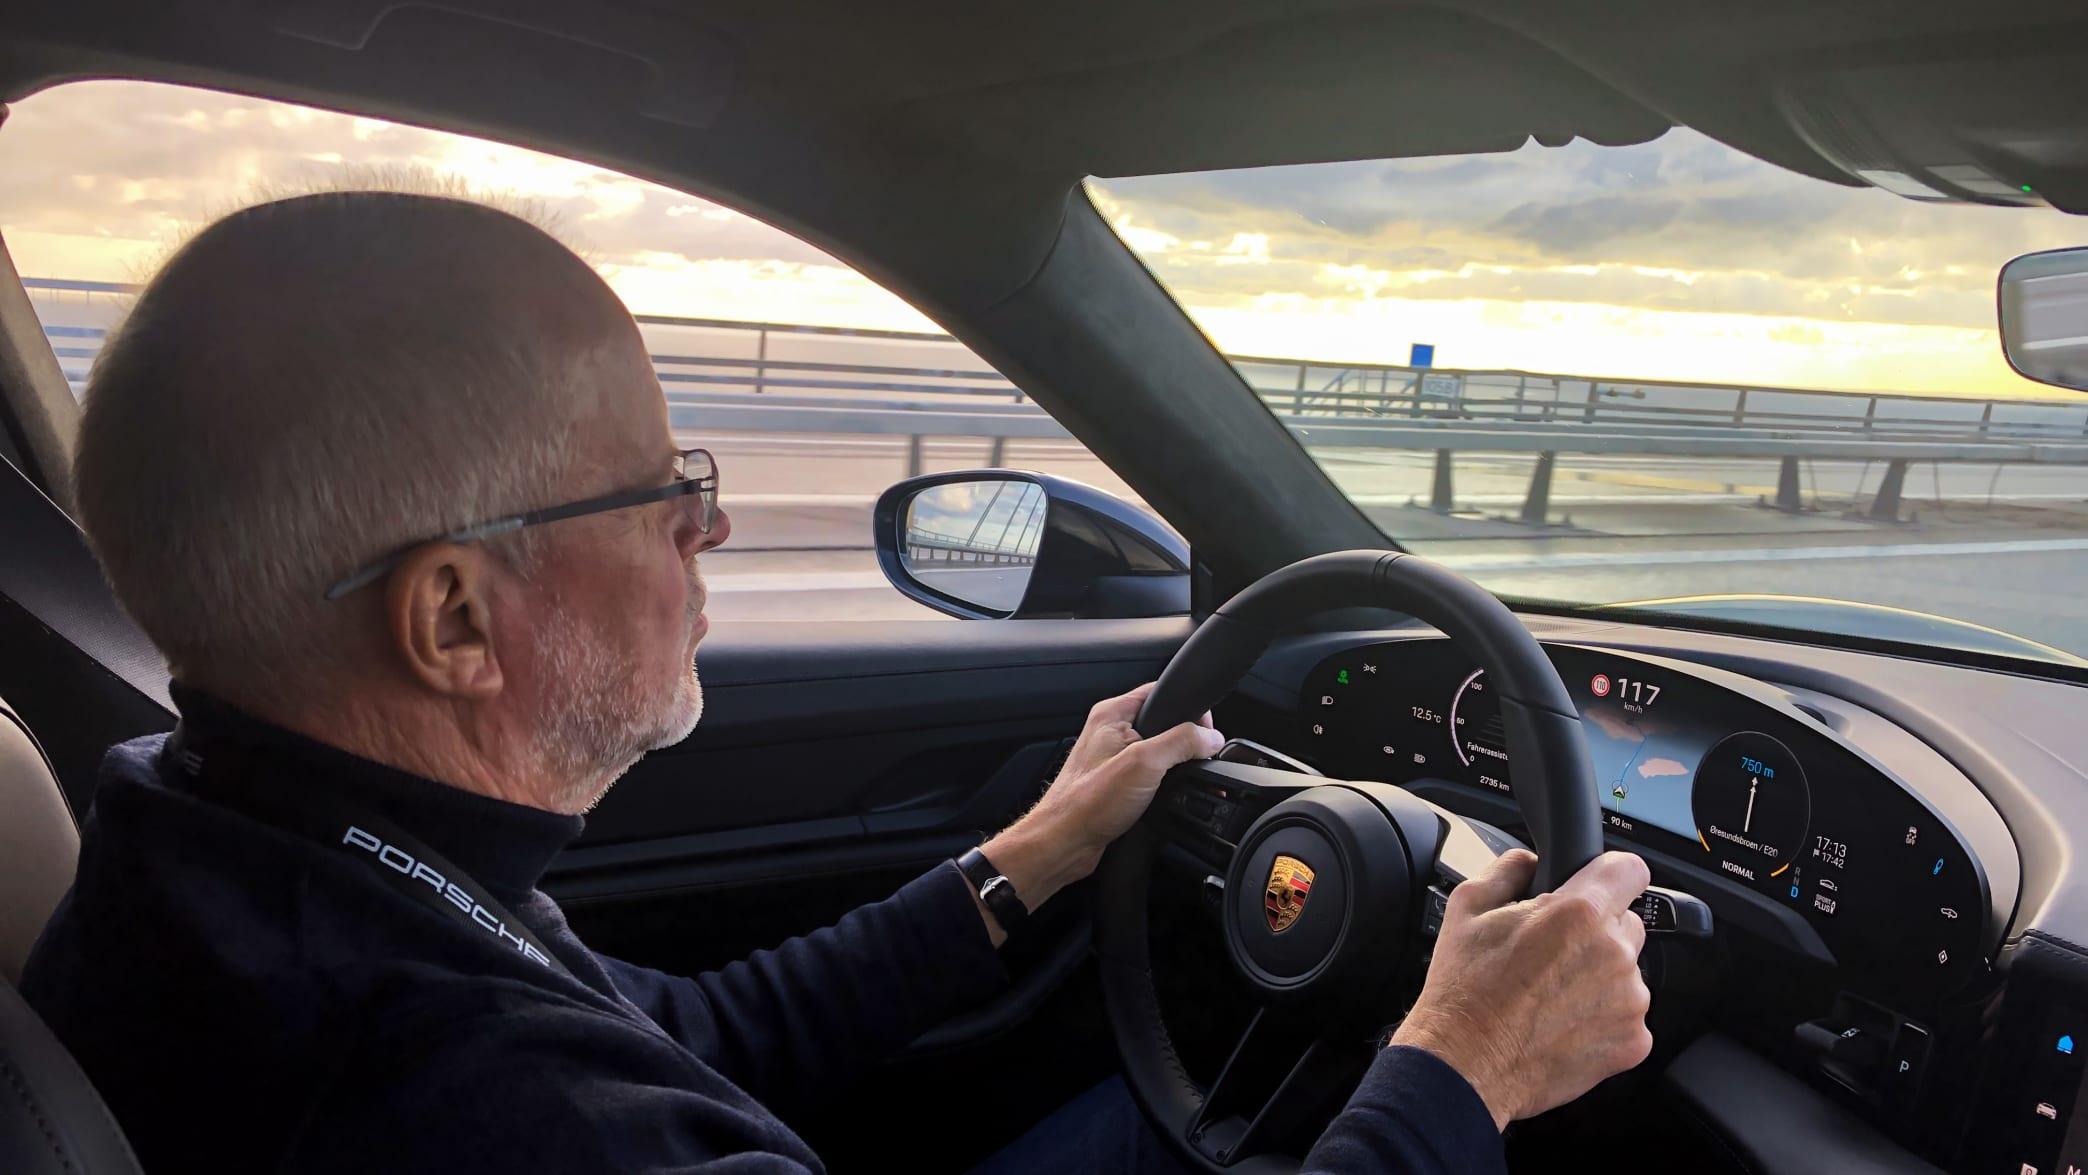 ADAC Redakteur Wolfgang Rudschies fährt einen Porsche Taycan